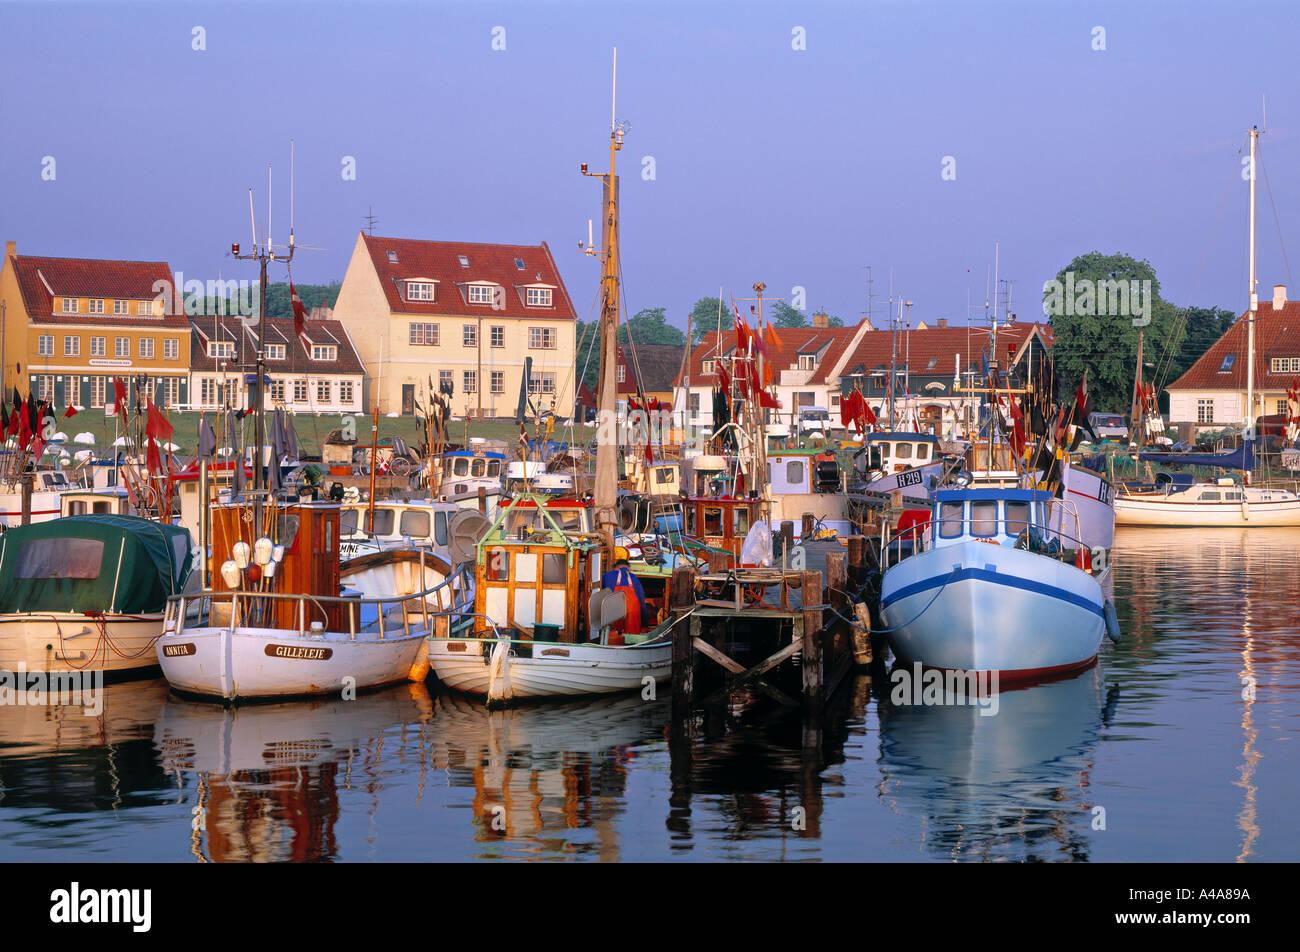 Gilleleje, Sjaelland, Denmark - Stock Image